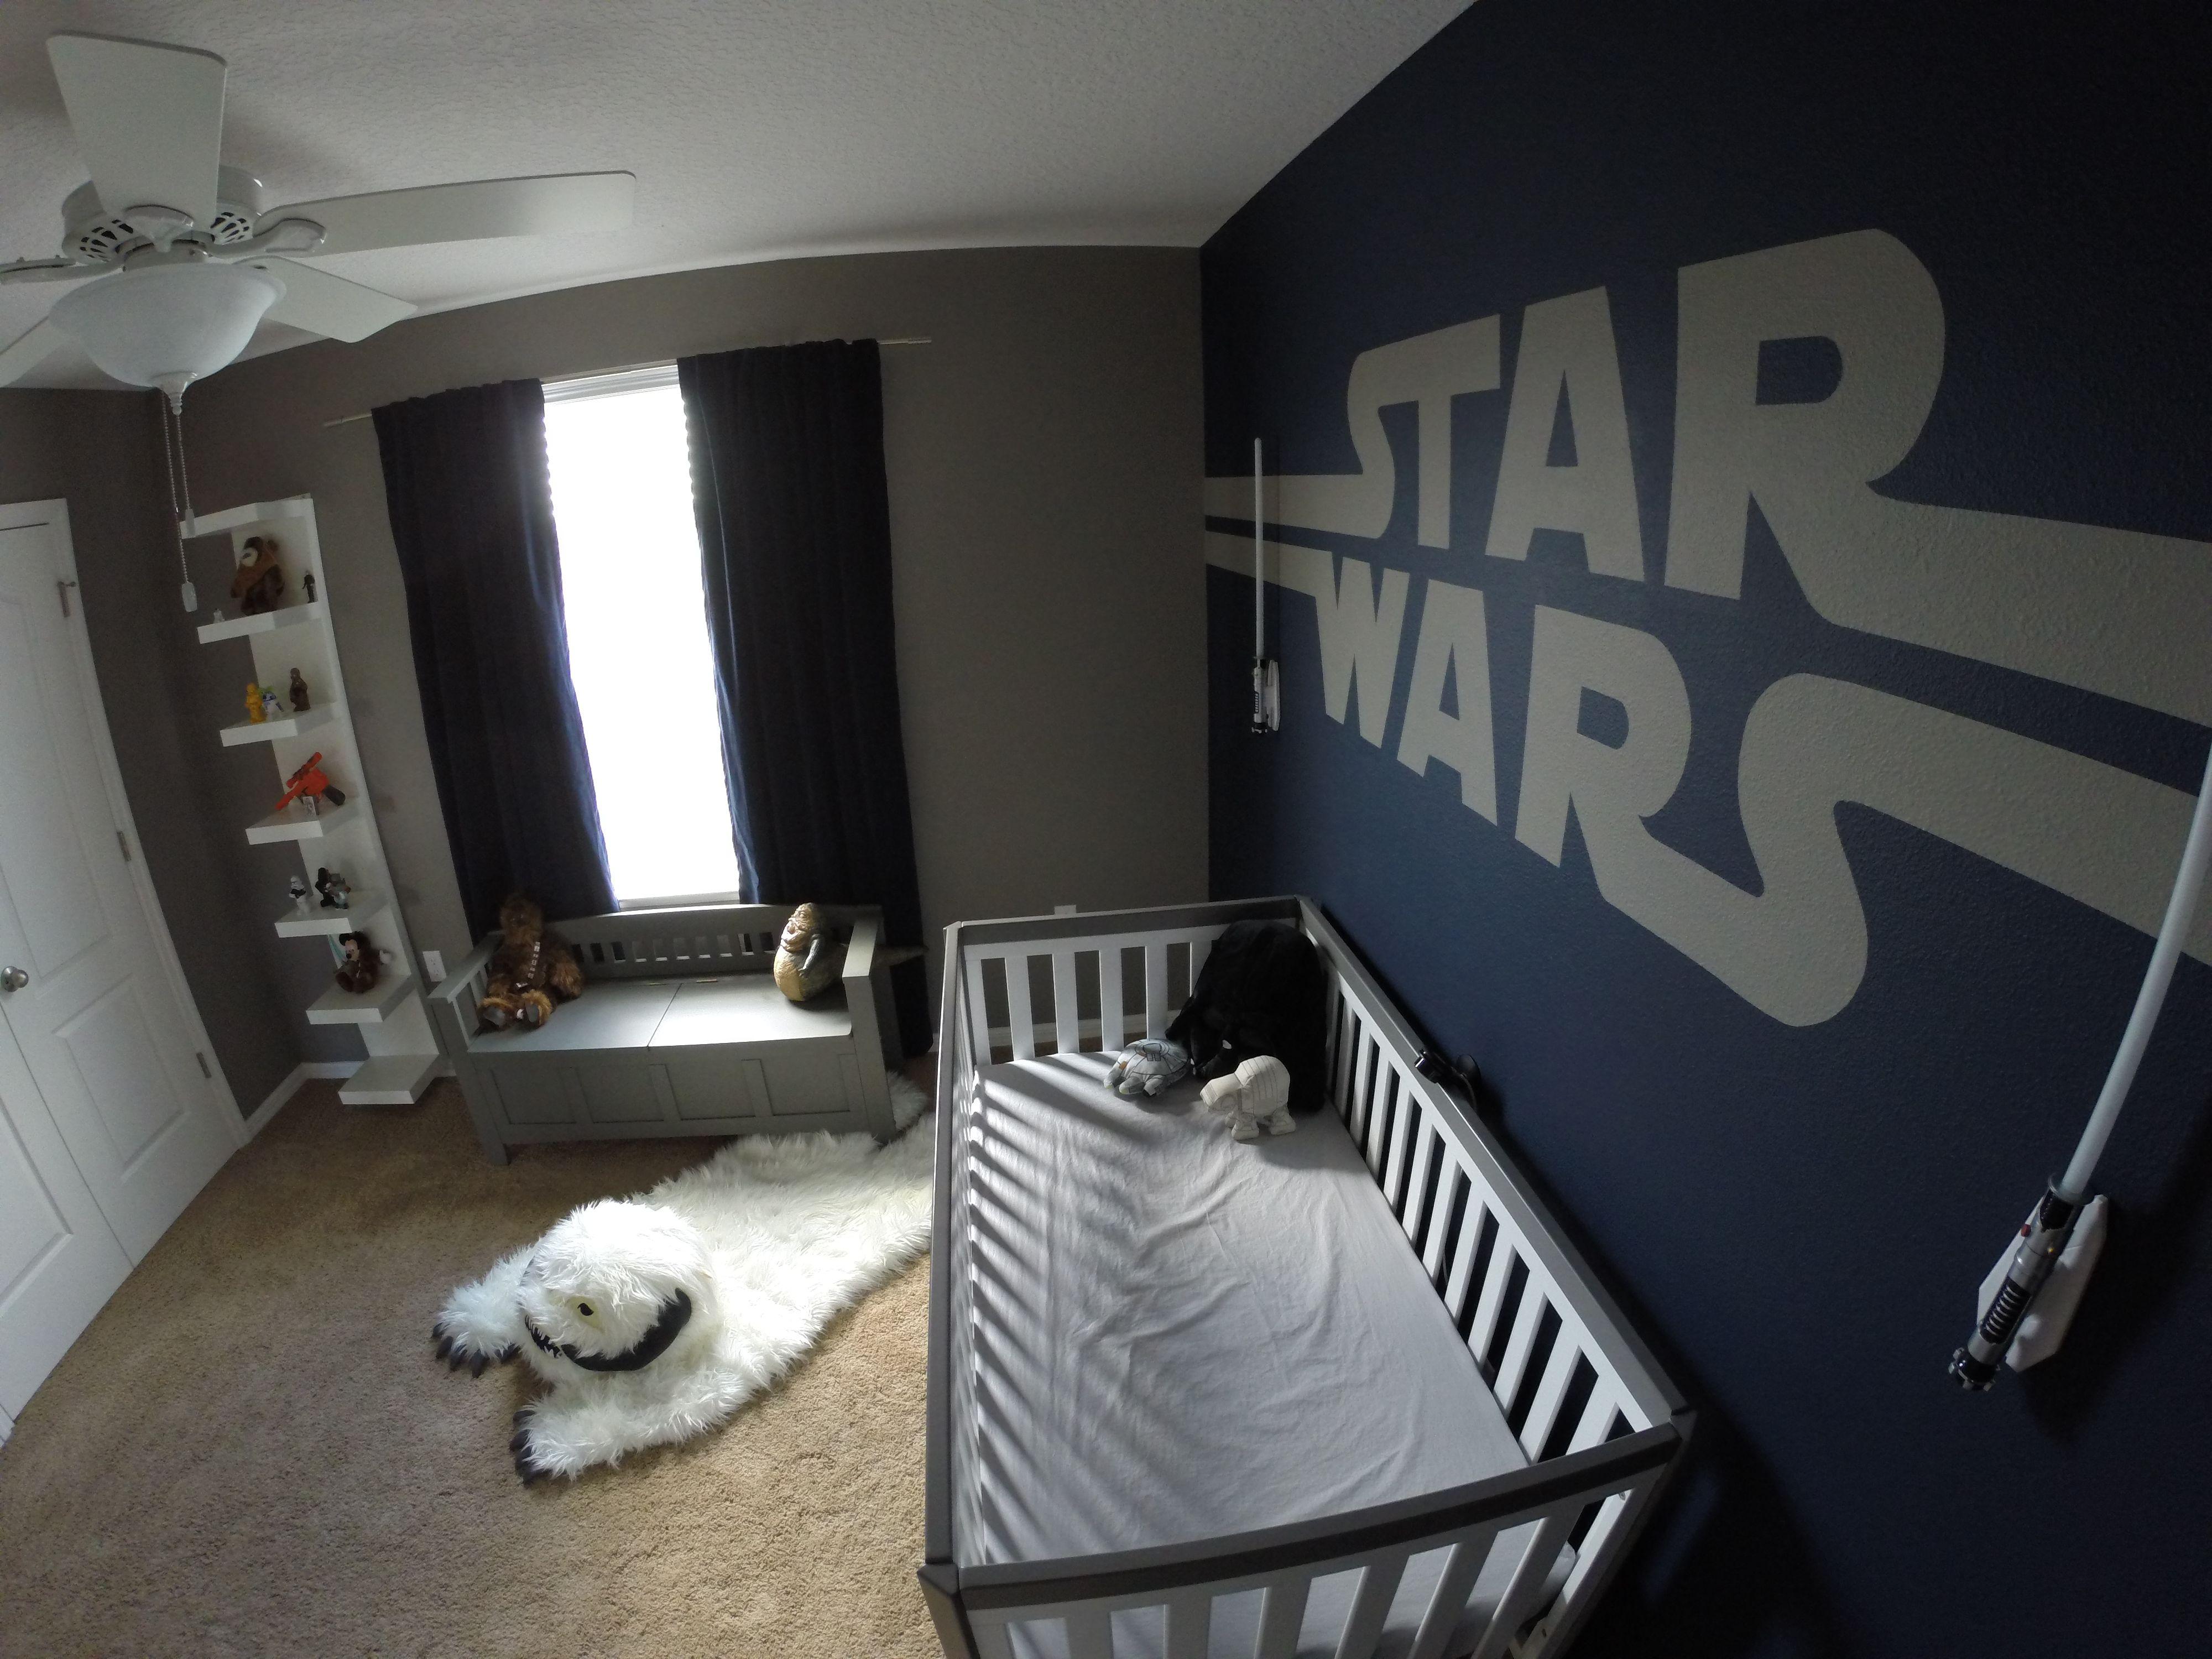 Star Wars themed nursery (Perspective #3)